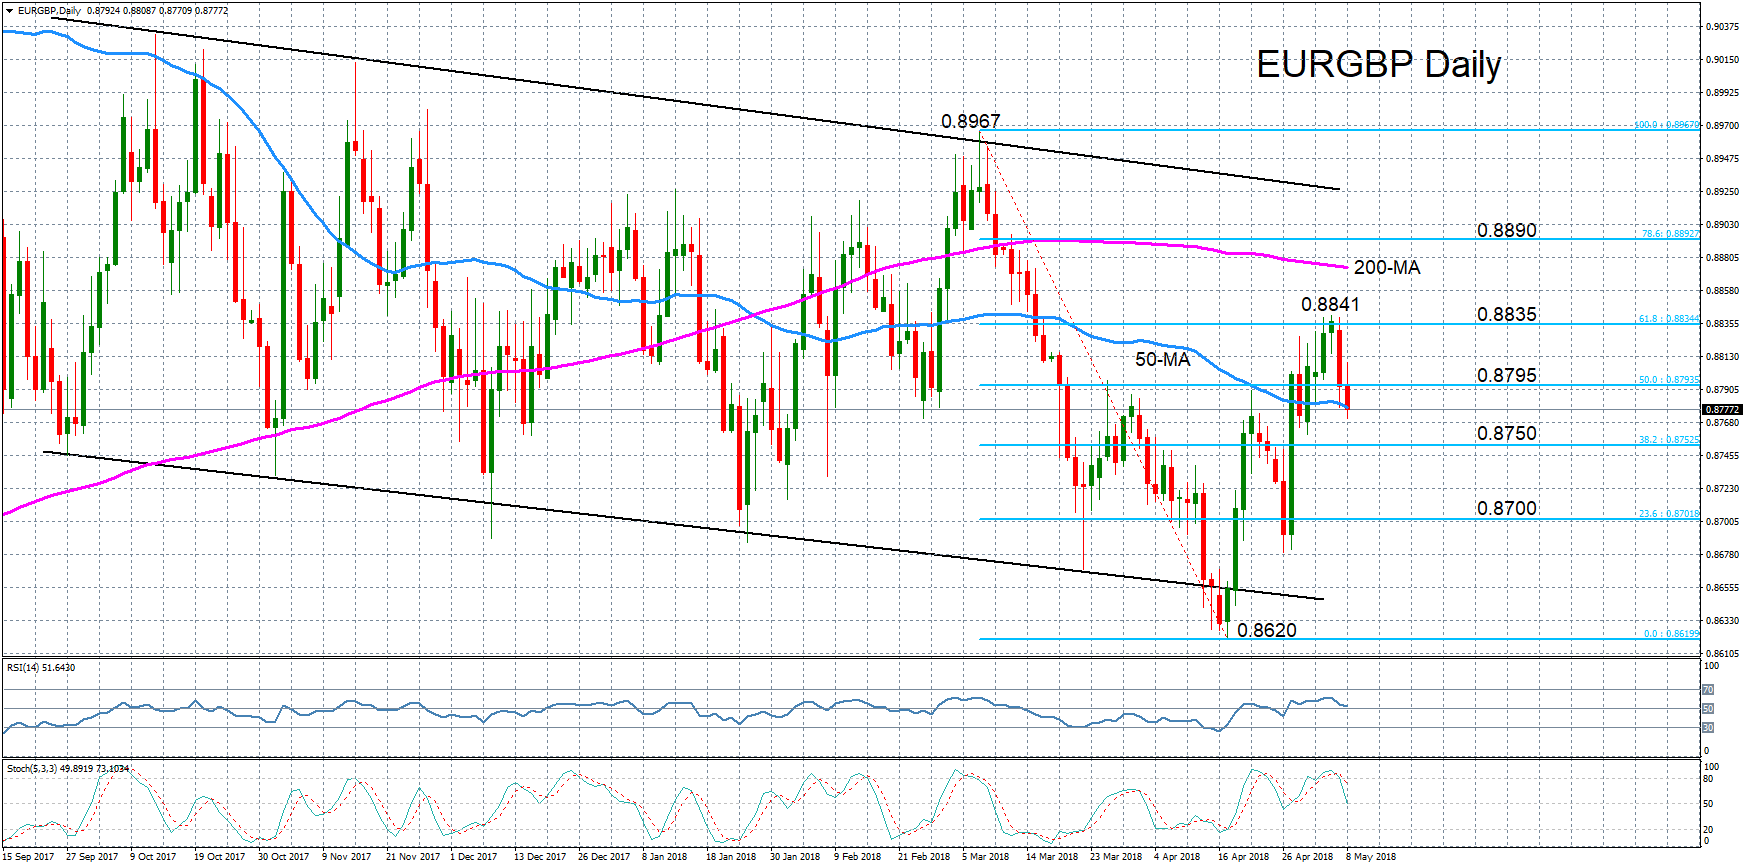 EUR/GBP 08/05/2018 | EconAlerts